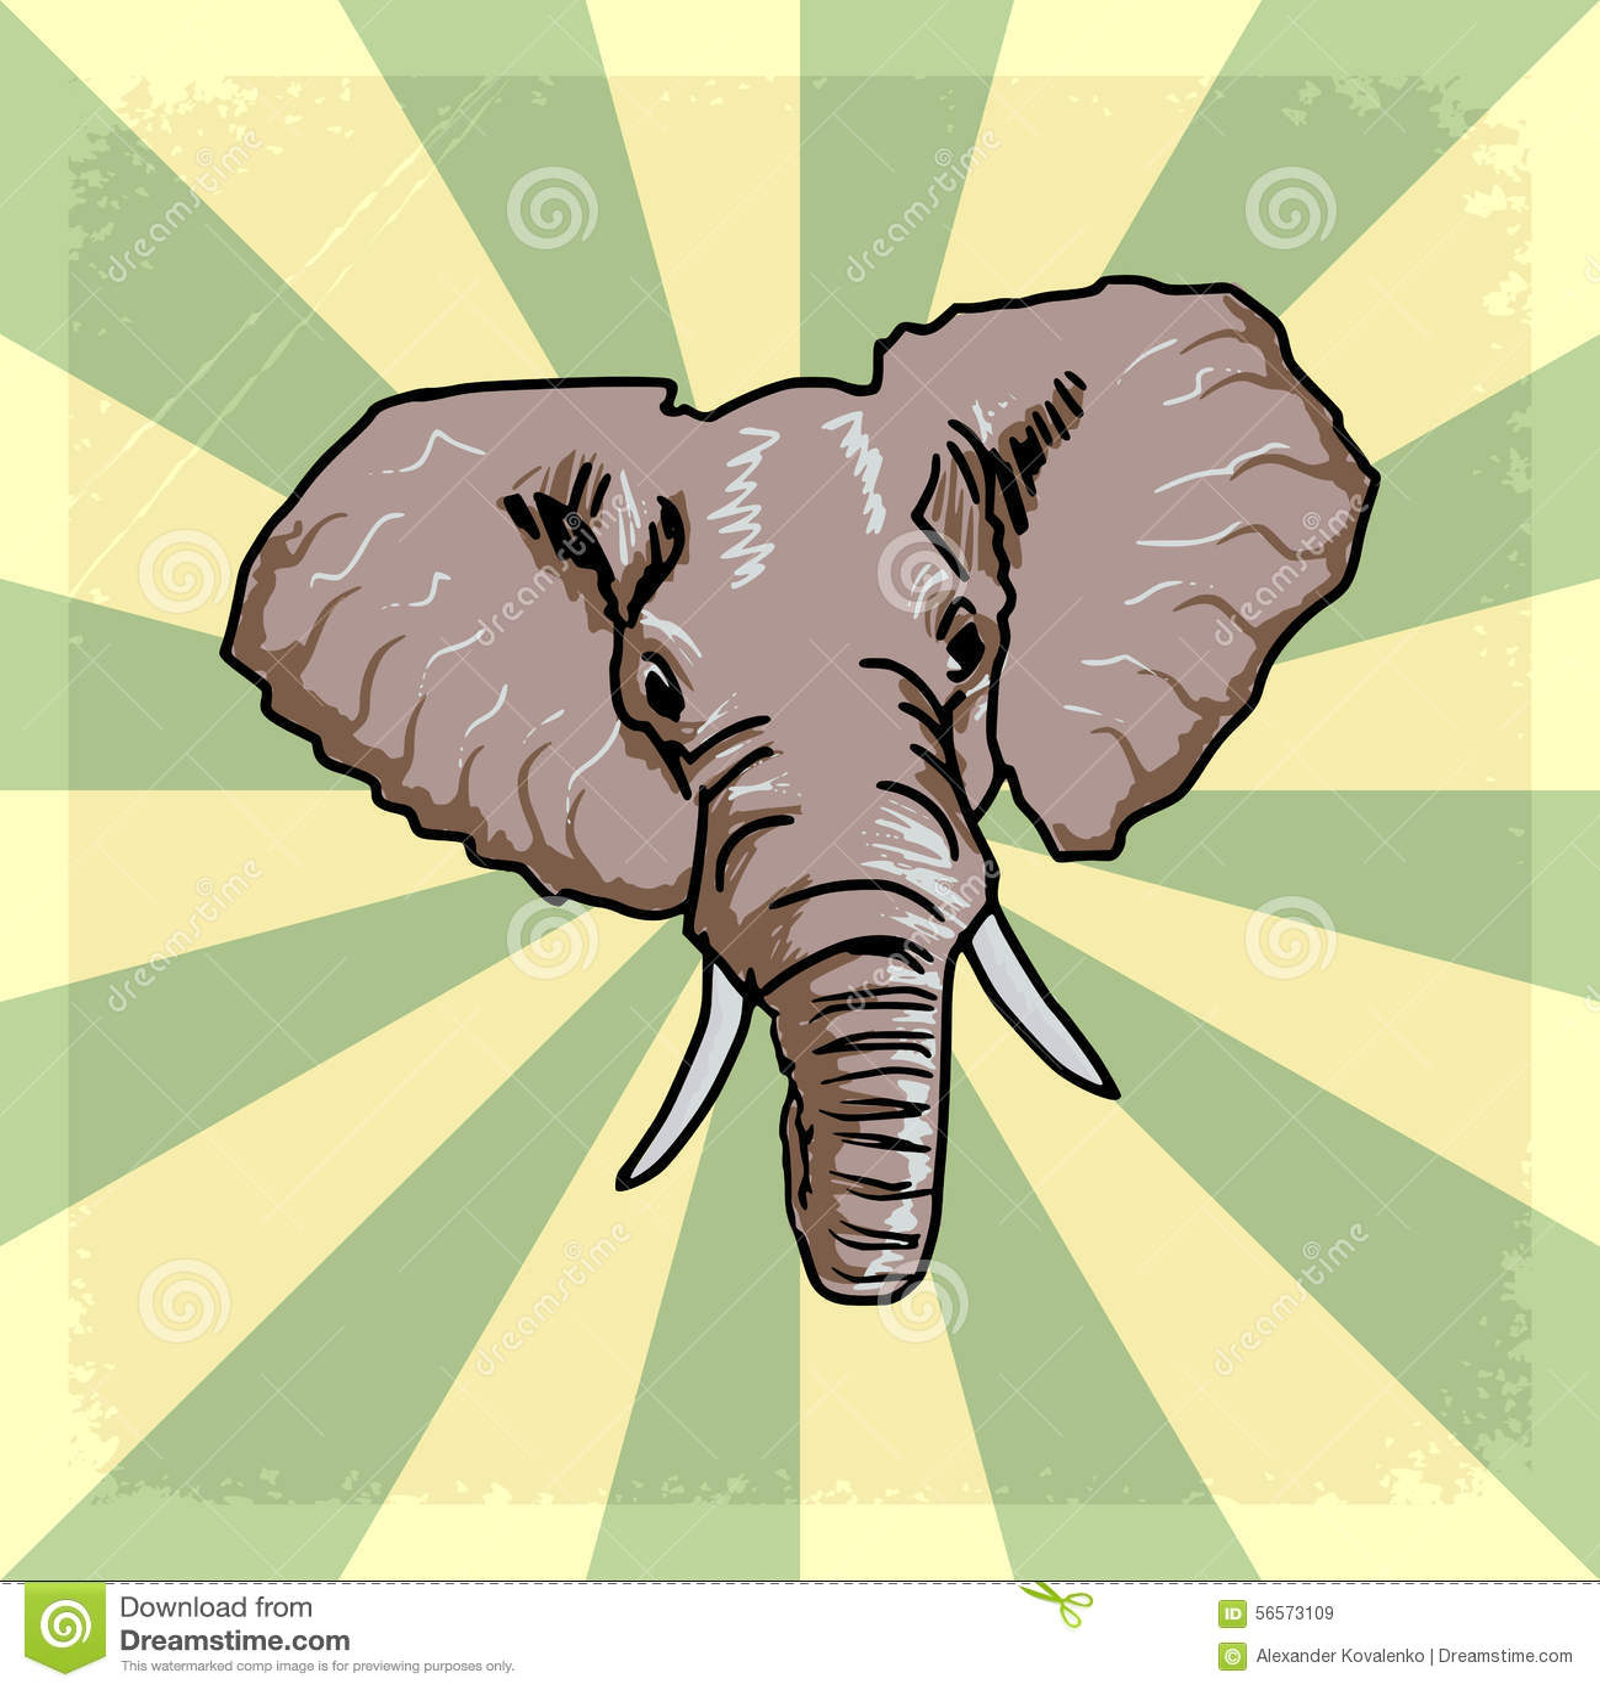 Download Εκλεκτής ποιότητας υπόβαθρο με τον ελέφαντα Απεικόνιση αποθεμάτων - εικονογραφία από antiquate, έγγραφο: 56573109